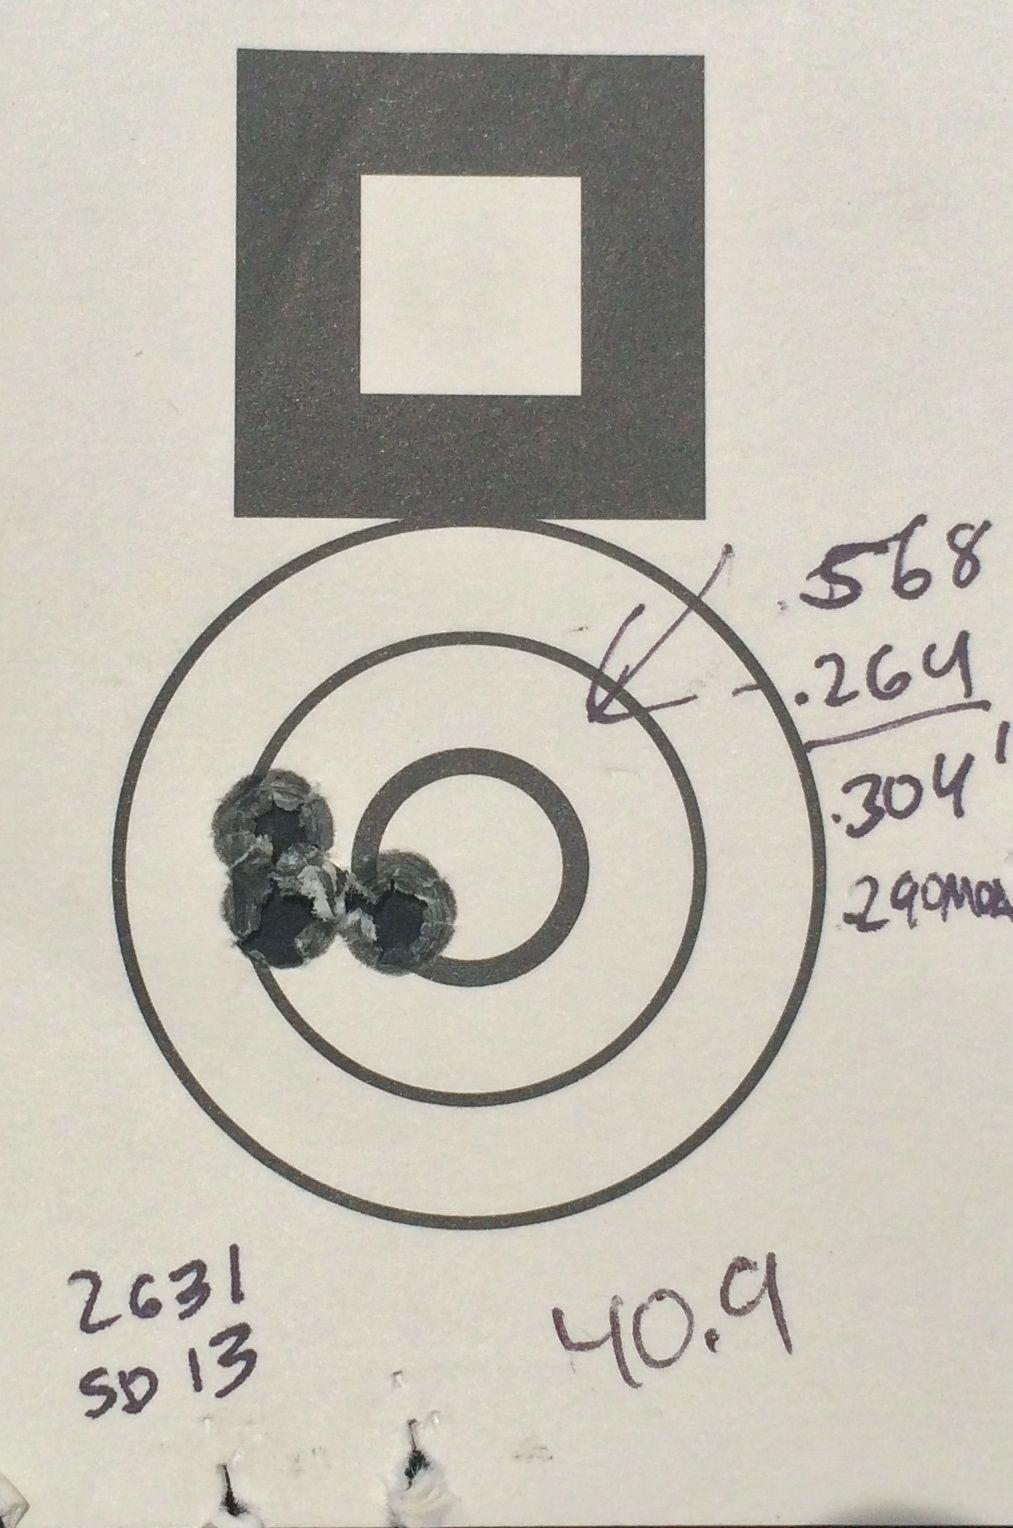 Top 12 Hodgdon H4350 6 5 Creedmoor Load Data - Gorgeous Tiny